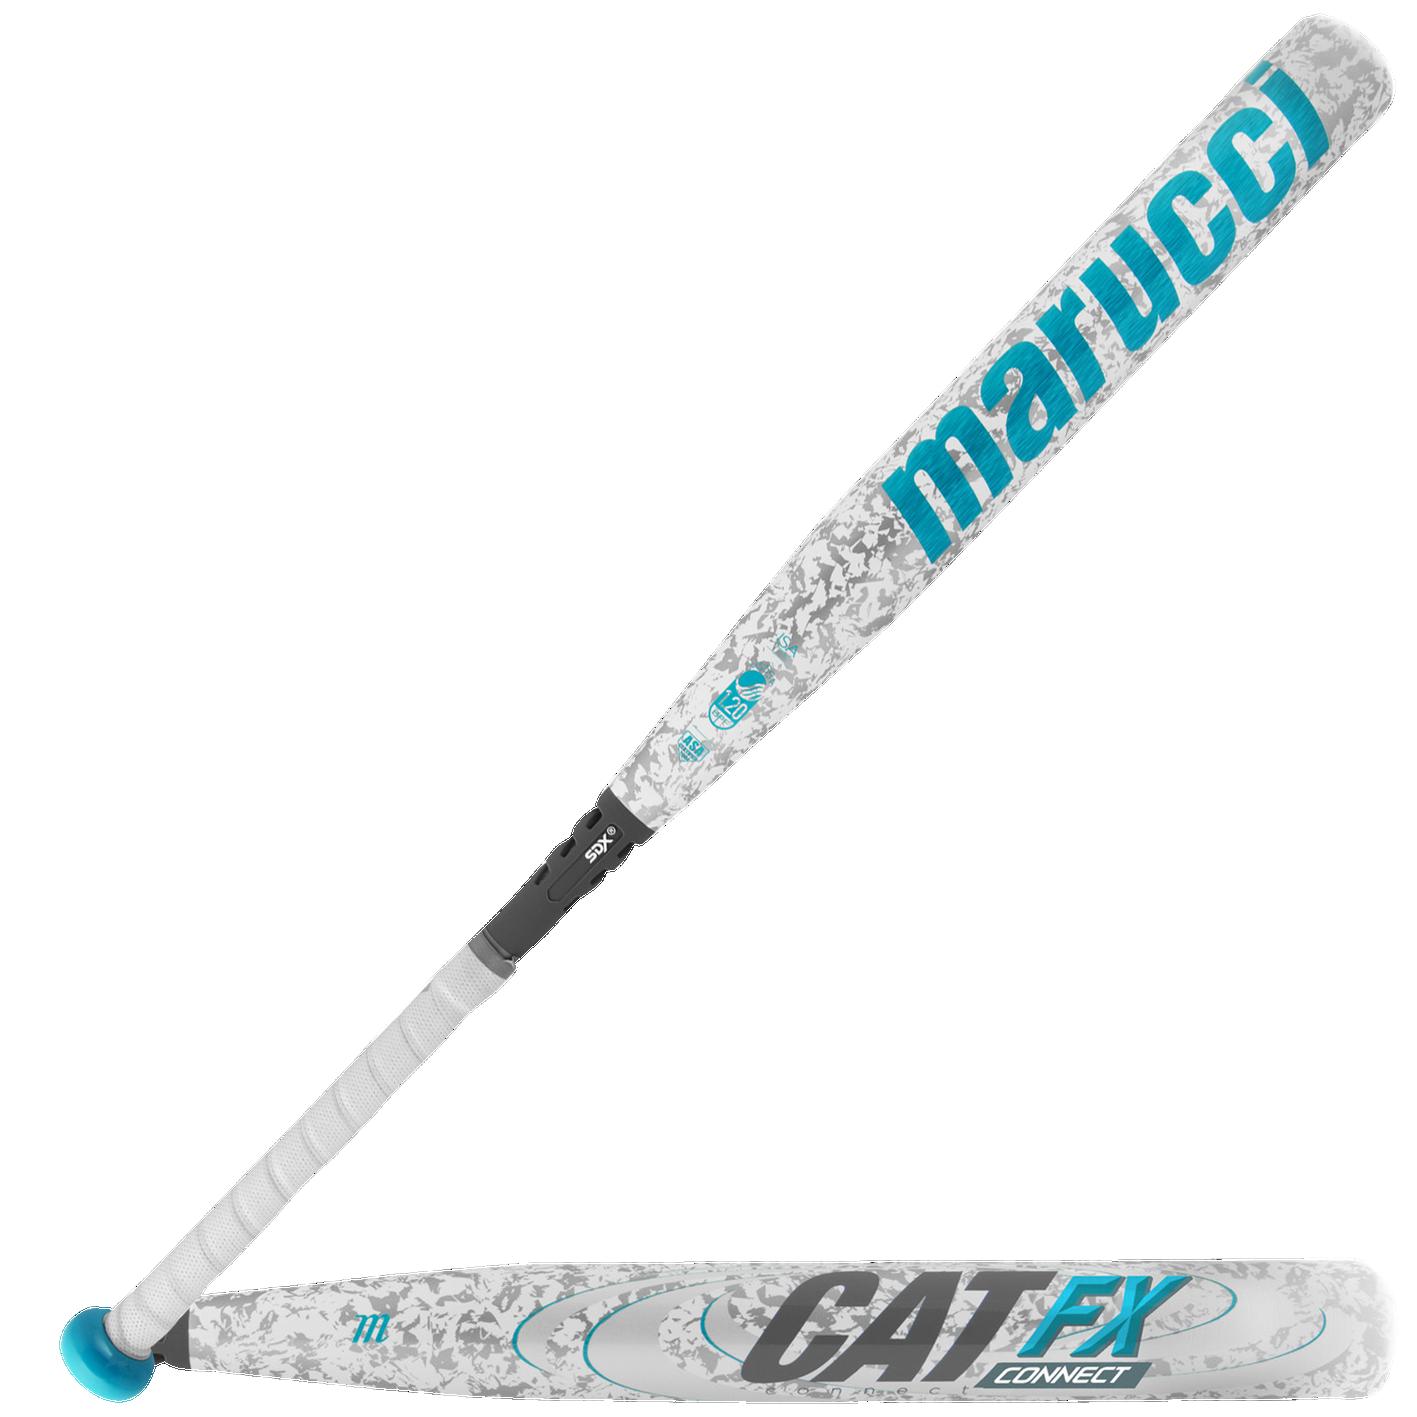 Marucci CAT FX Connect Fastpitch Bat - Women s - Softball - Sport ... 7dc8d47da